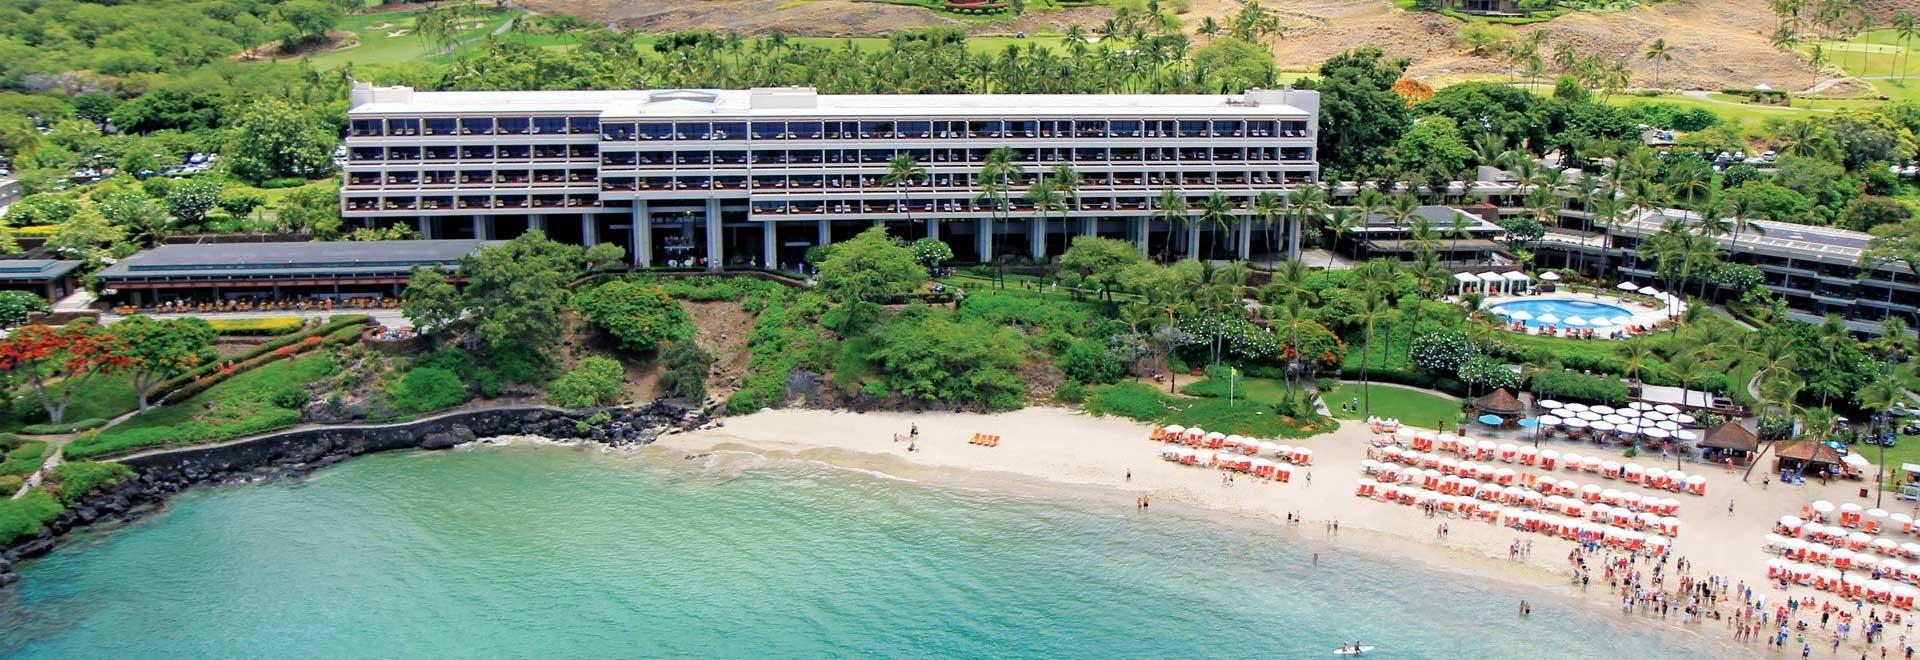 Mauna Kea Beach Hotel, Hawaii - World Tennis Travel